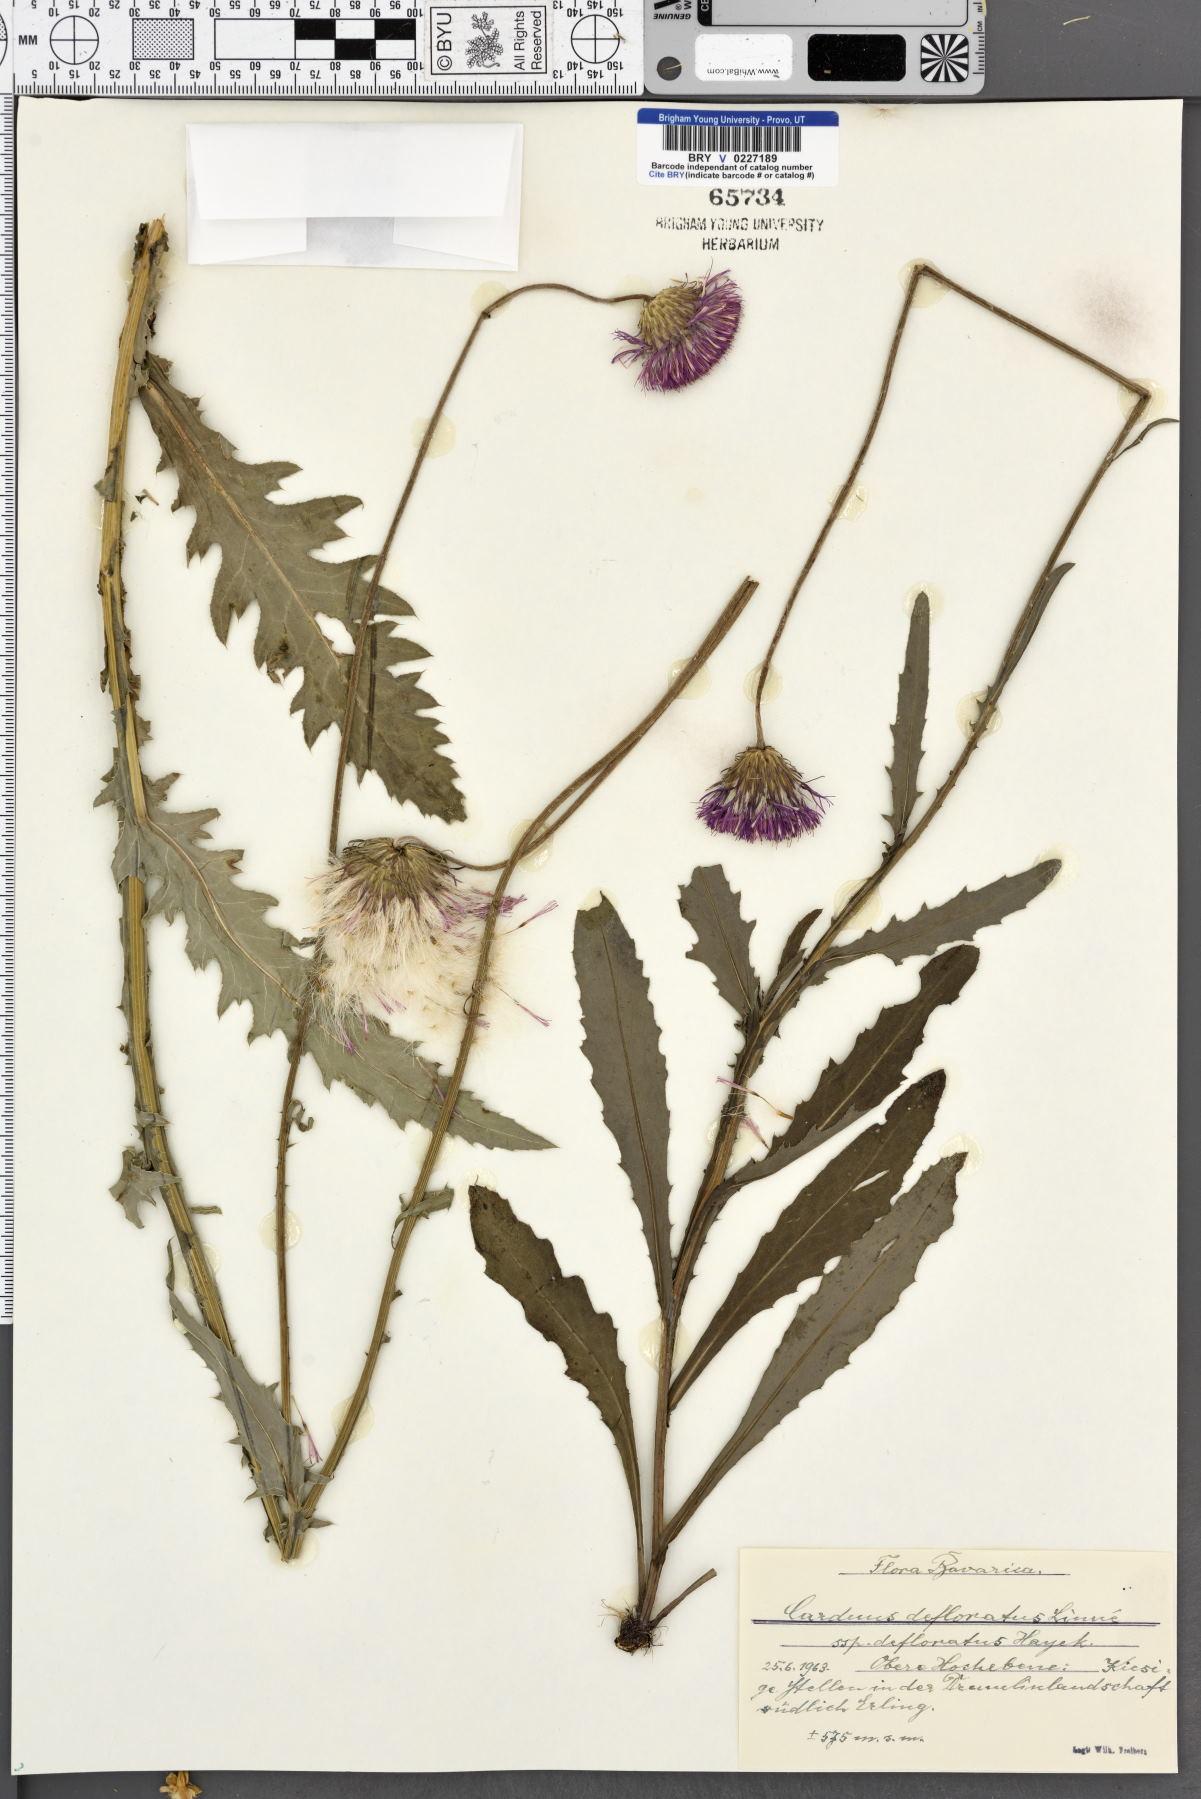 Carduus defloratus subsp. defloratus image